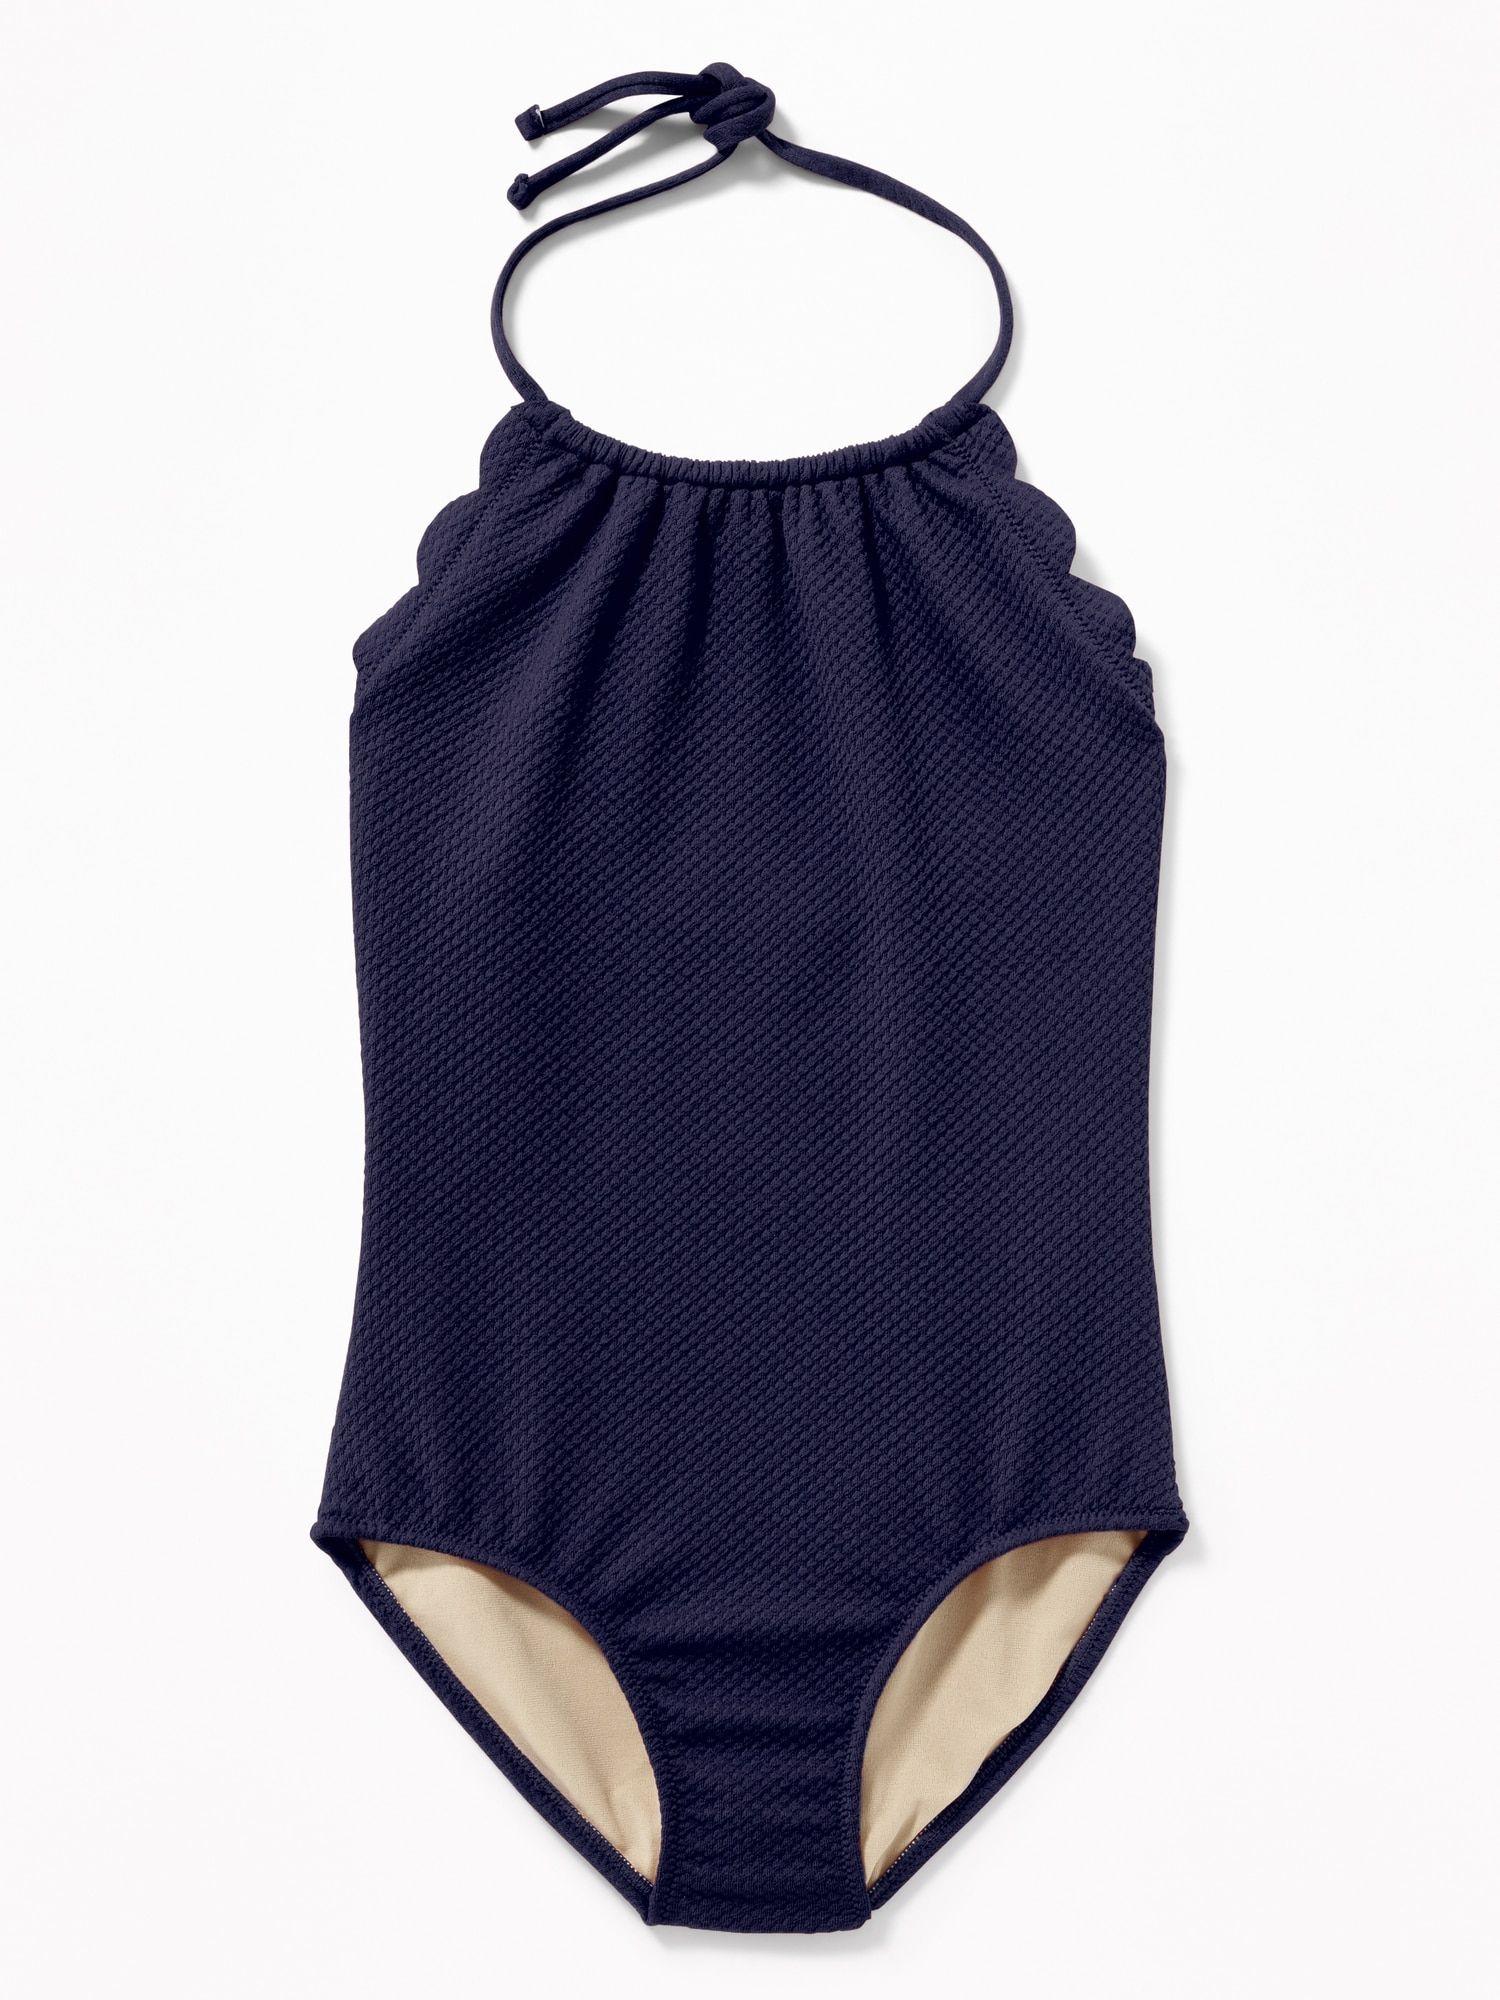 NWT Baby GAP Retro Polka Dot Printed Ruffle 1-piece Swimsuit Swimwear Girls 4 5